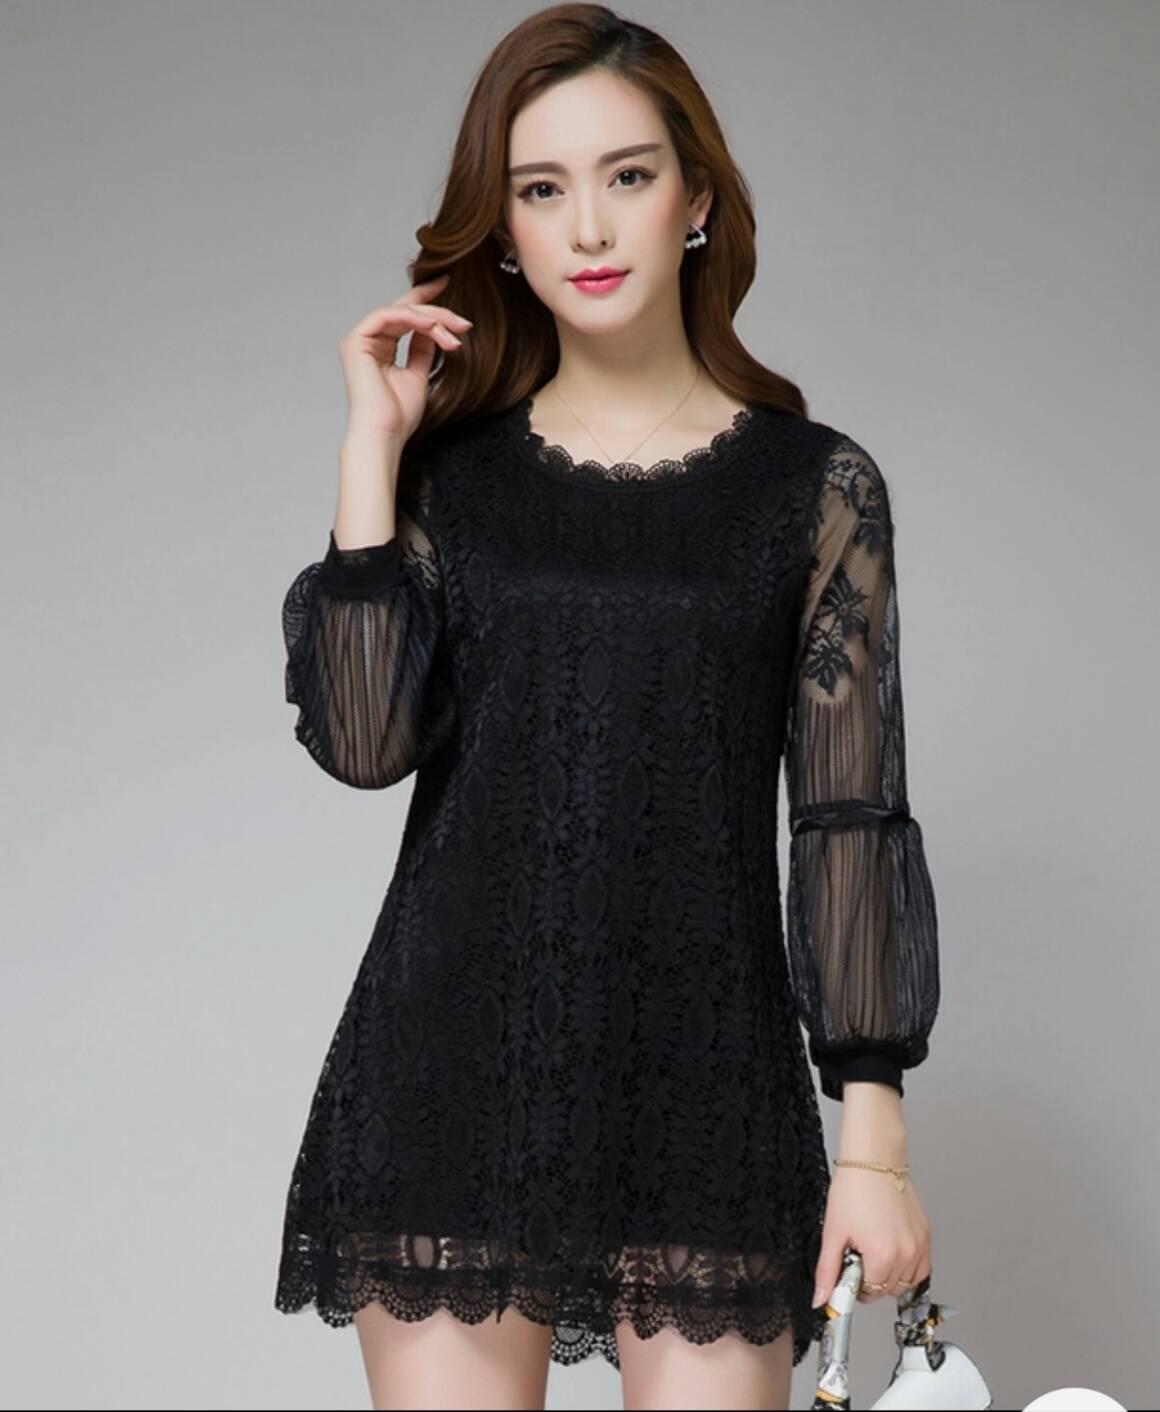 wOwchicy Dress : ชุดเดรสแขนยาว ลูกไม้สวยหรูสีดำ ด้วยดีไซส์ช่วงแขนพองสวยโดดเด่นไม่ซ้ำใคร งานลูกไม้เนื้อนิ่มทั้งชุด มีซับใน งานคุณภาพนำเข้า